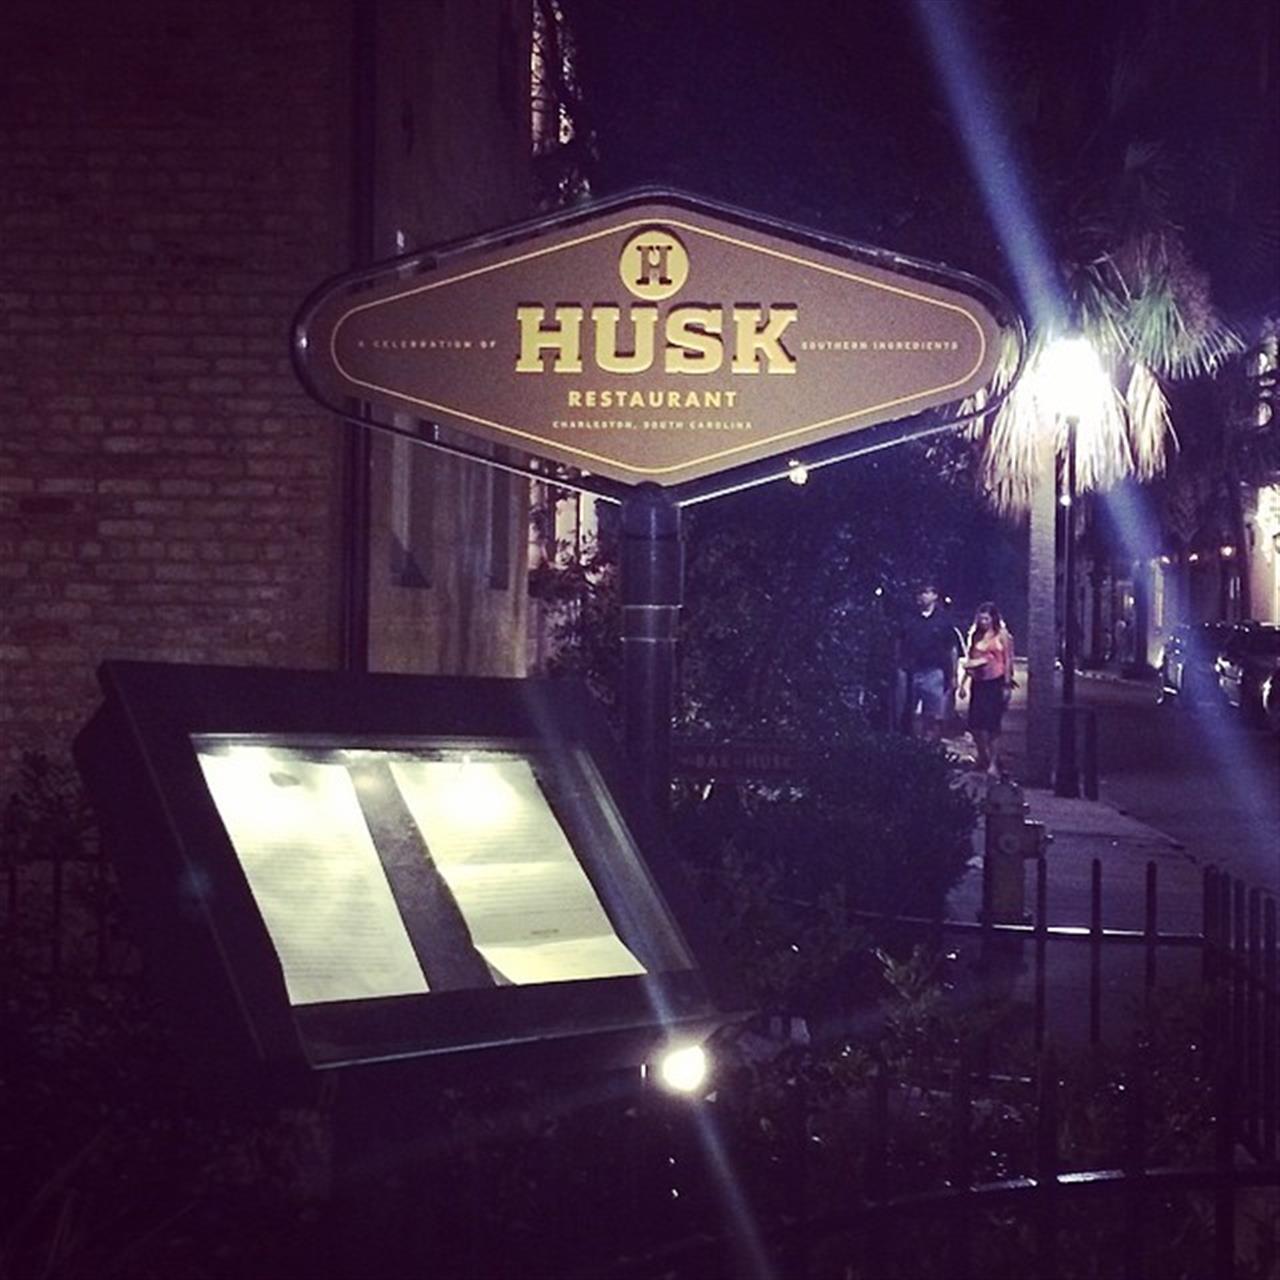 A perfect end to a fabulous #charleston trip! #huskcharleston #food #foodblog #restaurant #aasquaredblog